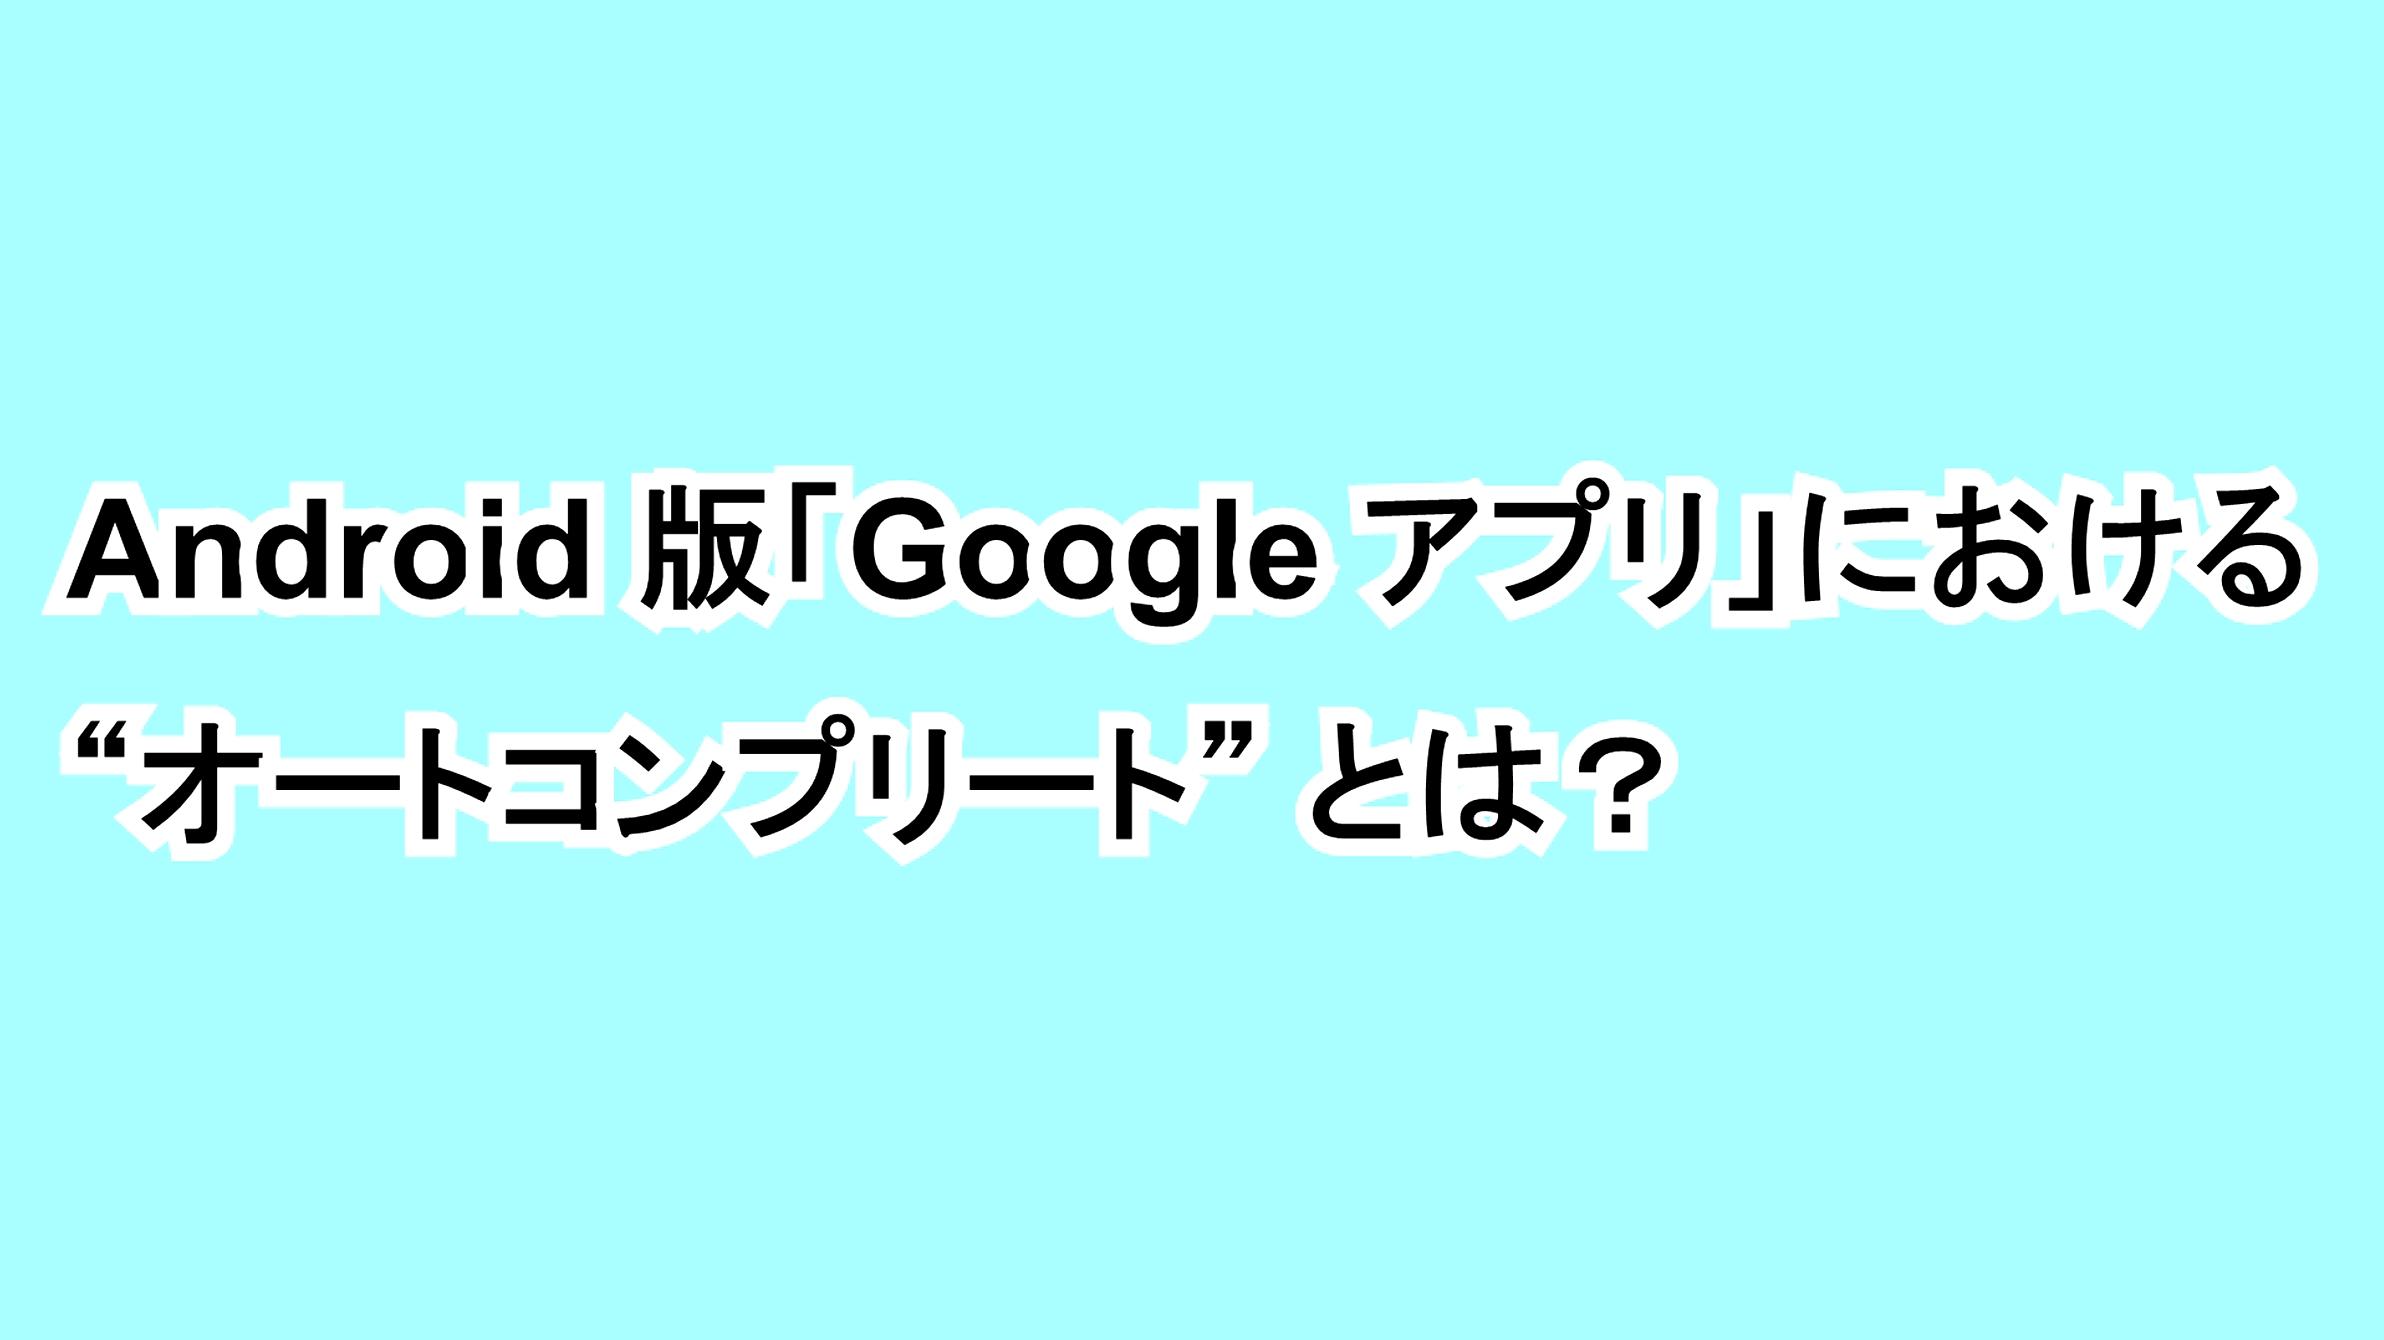 "Android版「Google アプリ」における""オートコンプリート""とは?"